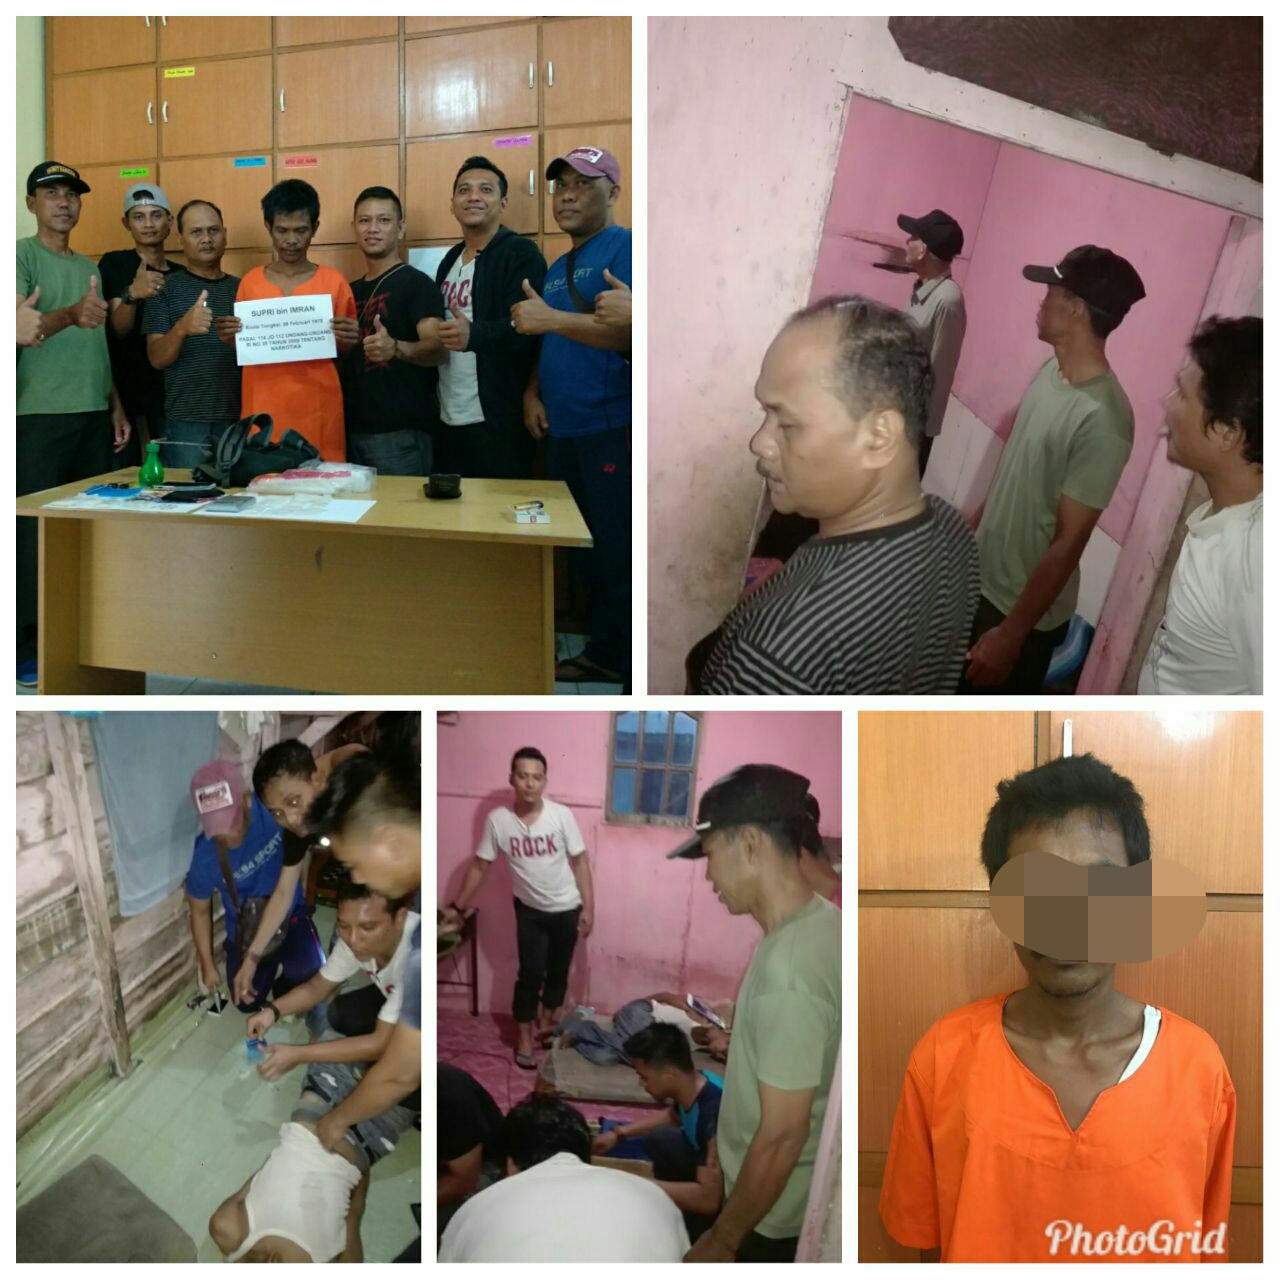 Berkat Info Masyarakat Bandar Sabu Berhasil Diamankan Jajaran Tcash Vaganza 17 Kk New Motif 2016 Sungai Guntung Puterariaucom